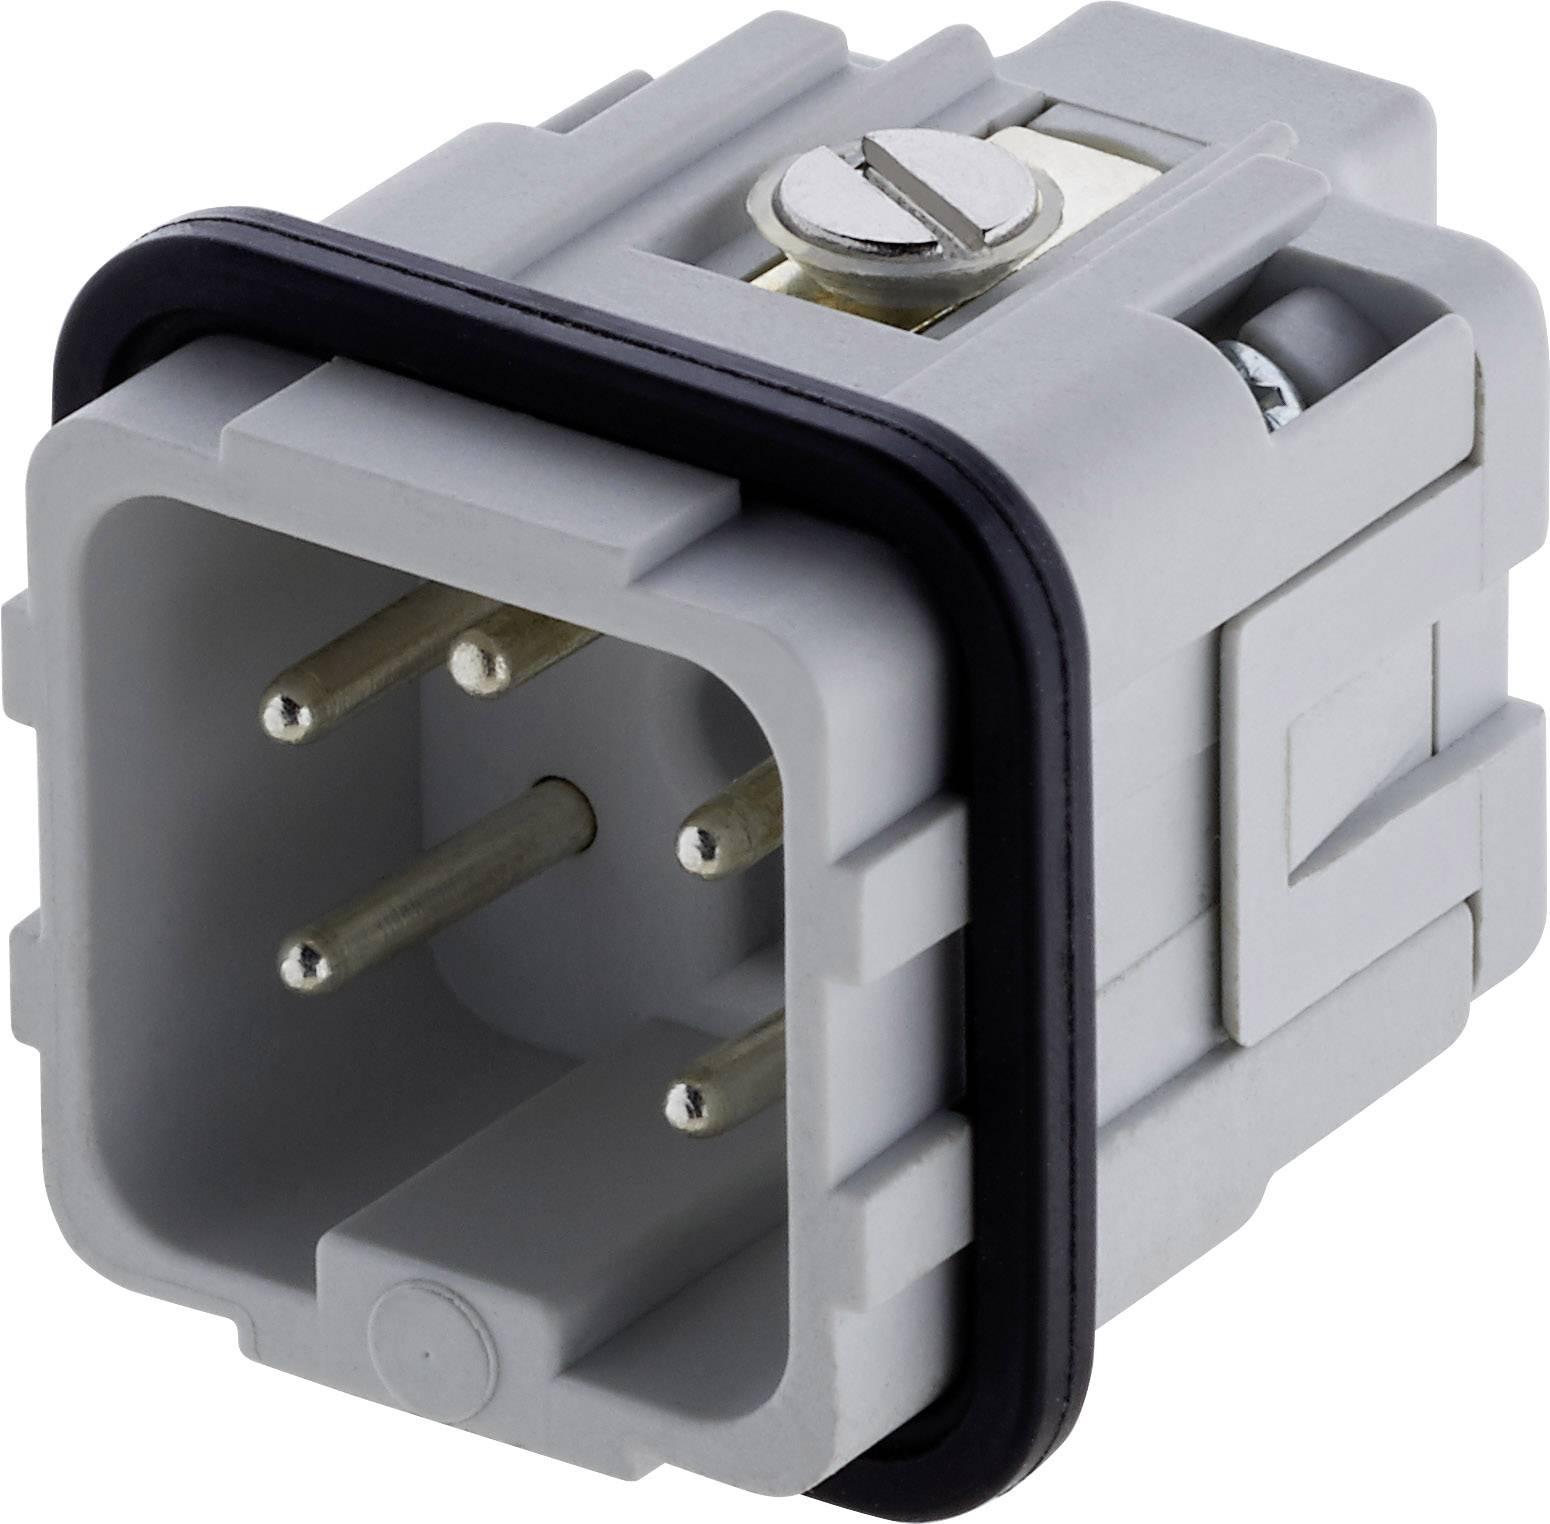 Vložka pinového konektoru Heavy mate® C146 C146 10A004 002 4 Amphenol, počet kontaktů: 4 + PE, 1 ks